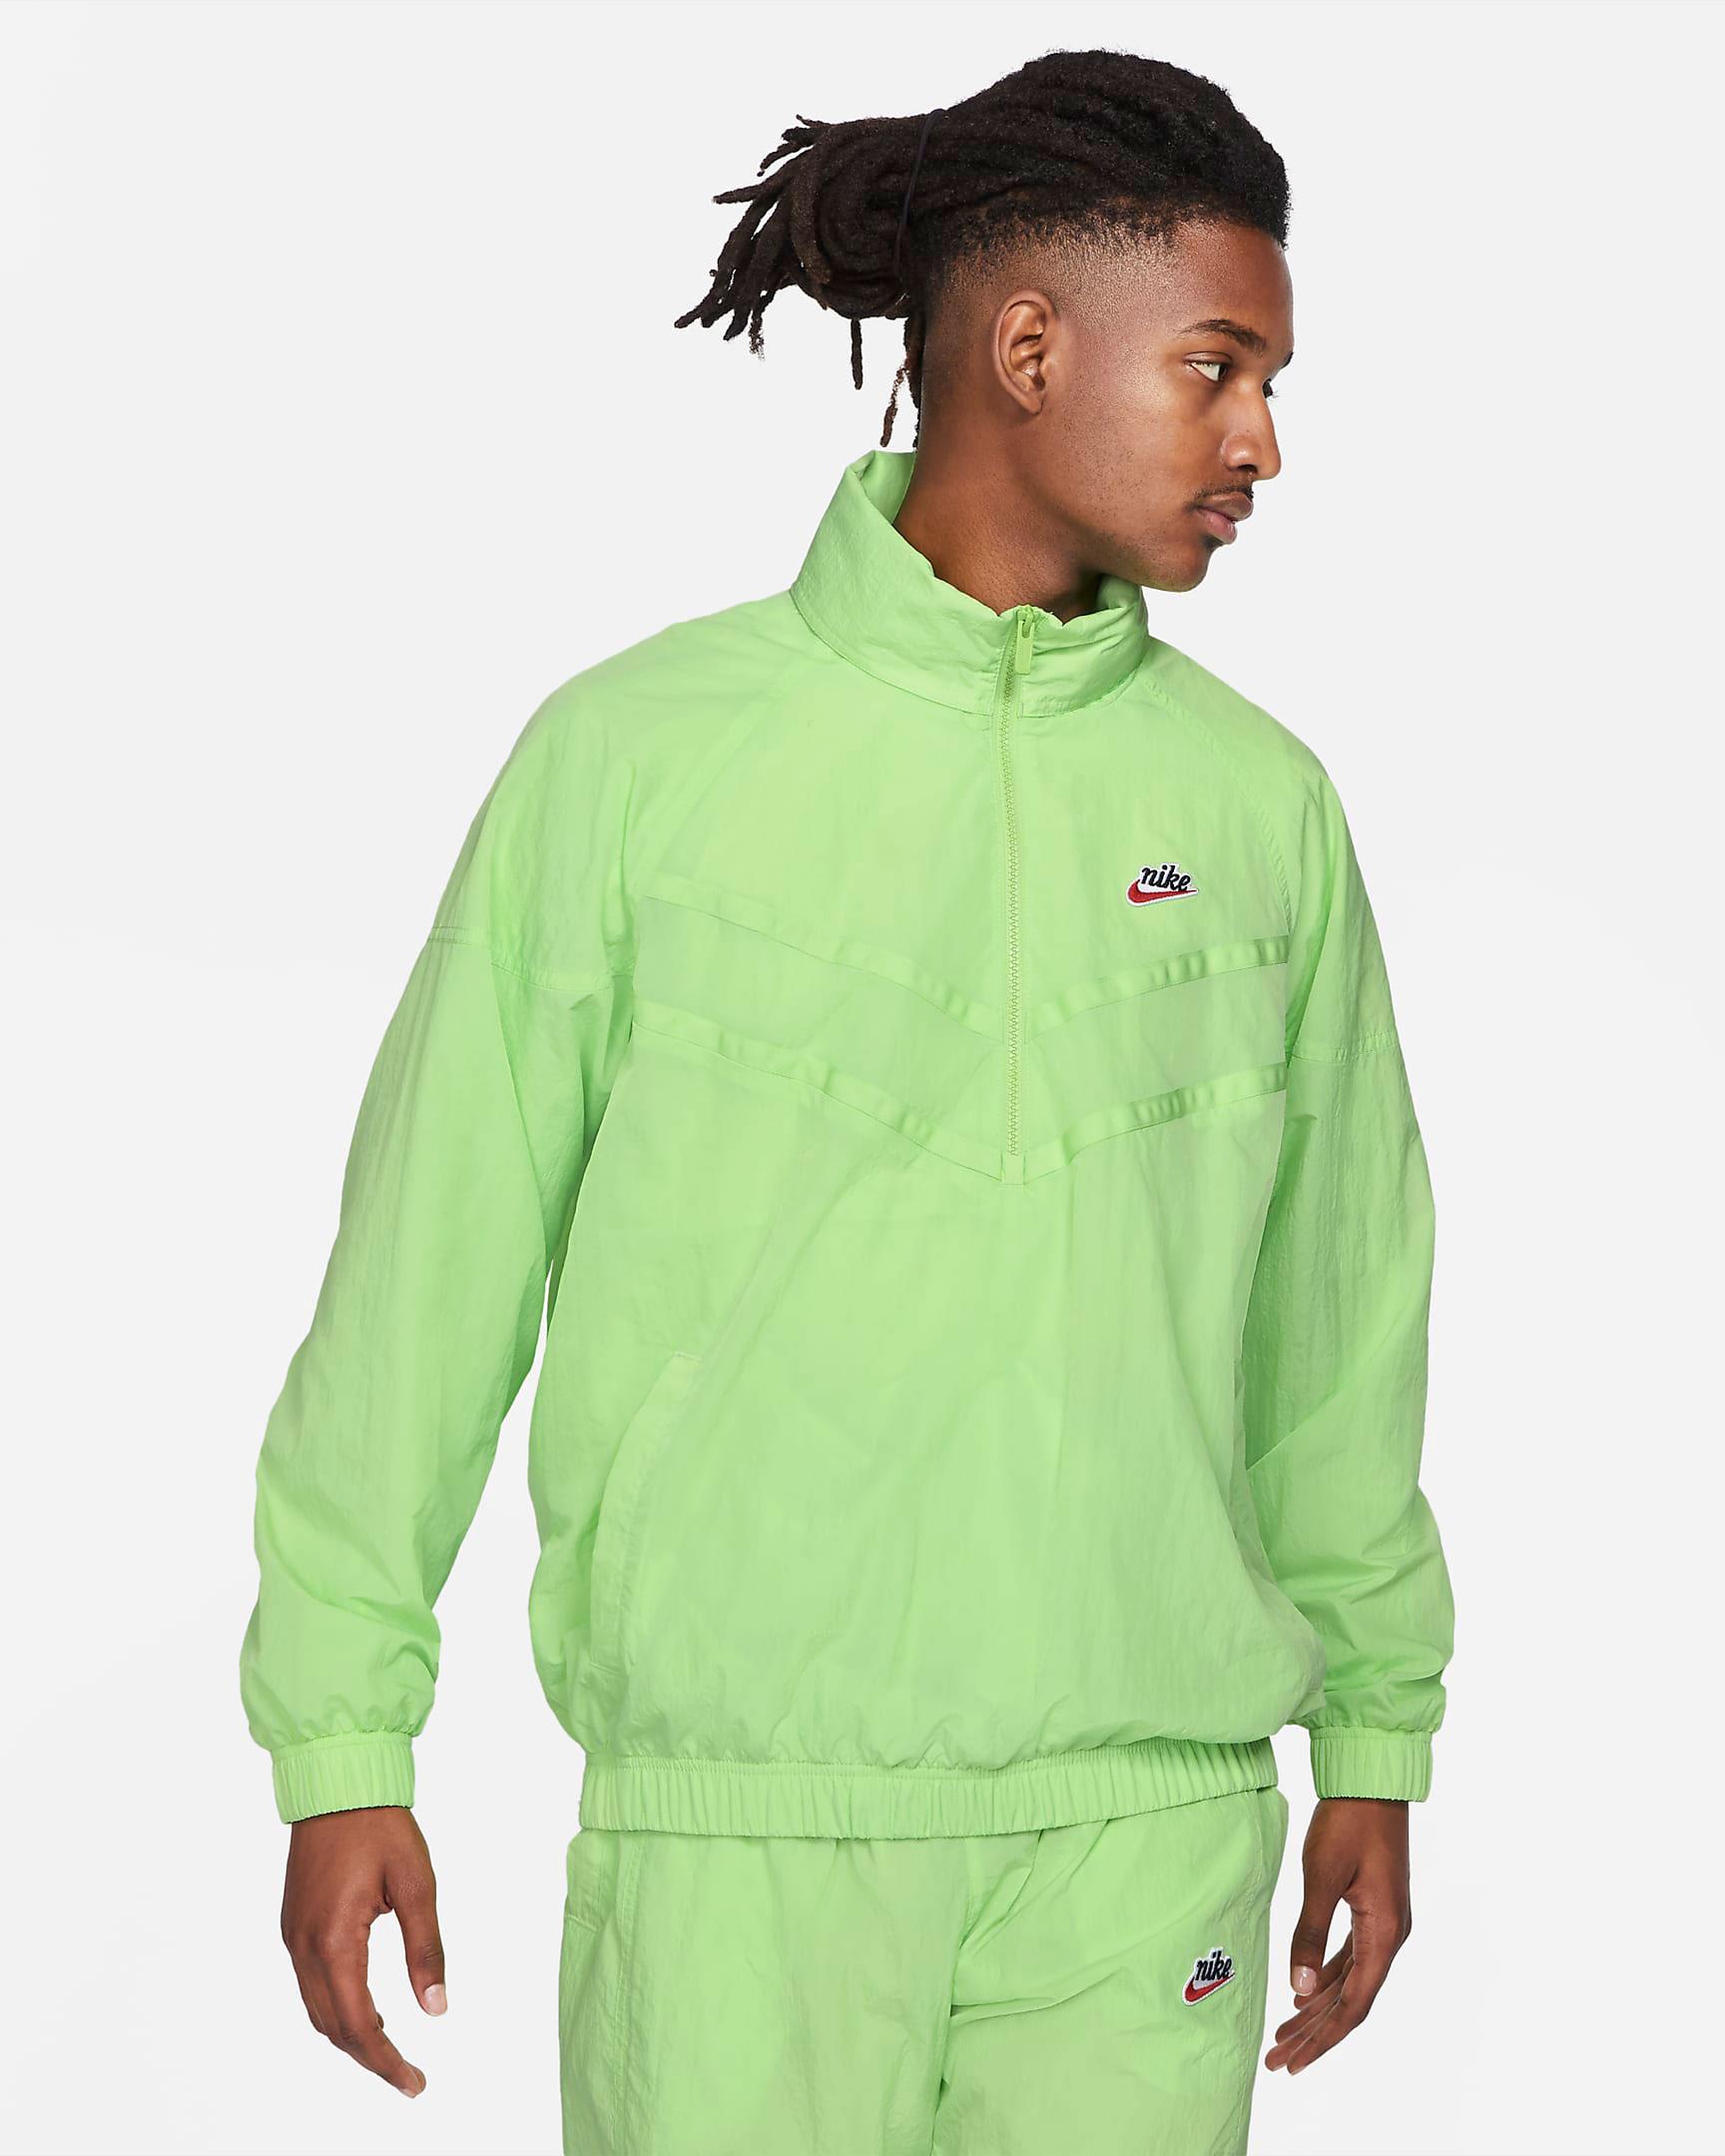 nike-lime-heritage-windrunner-jacket